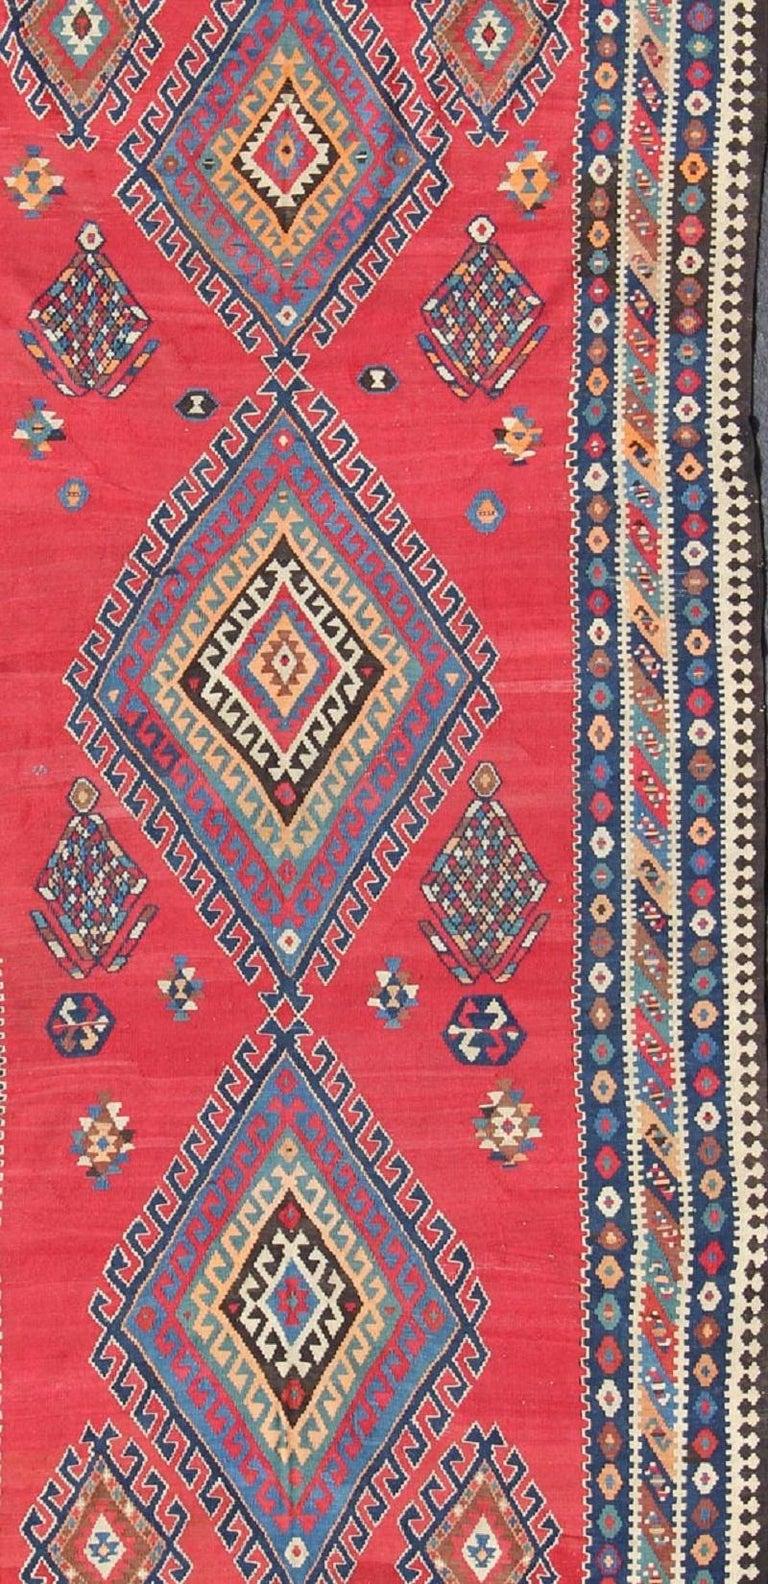 Antique Persian Qashqai Kilim Gallery Rug with Geometric Diamond Design In Good Condition For Sale In Atlanta, GA